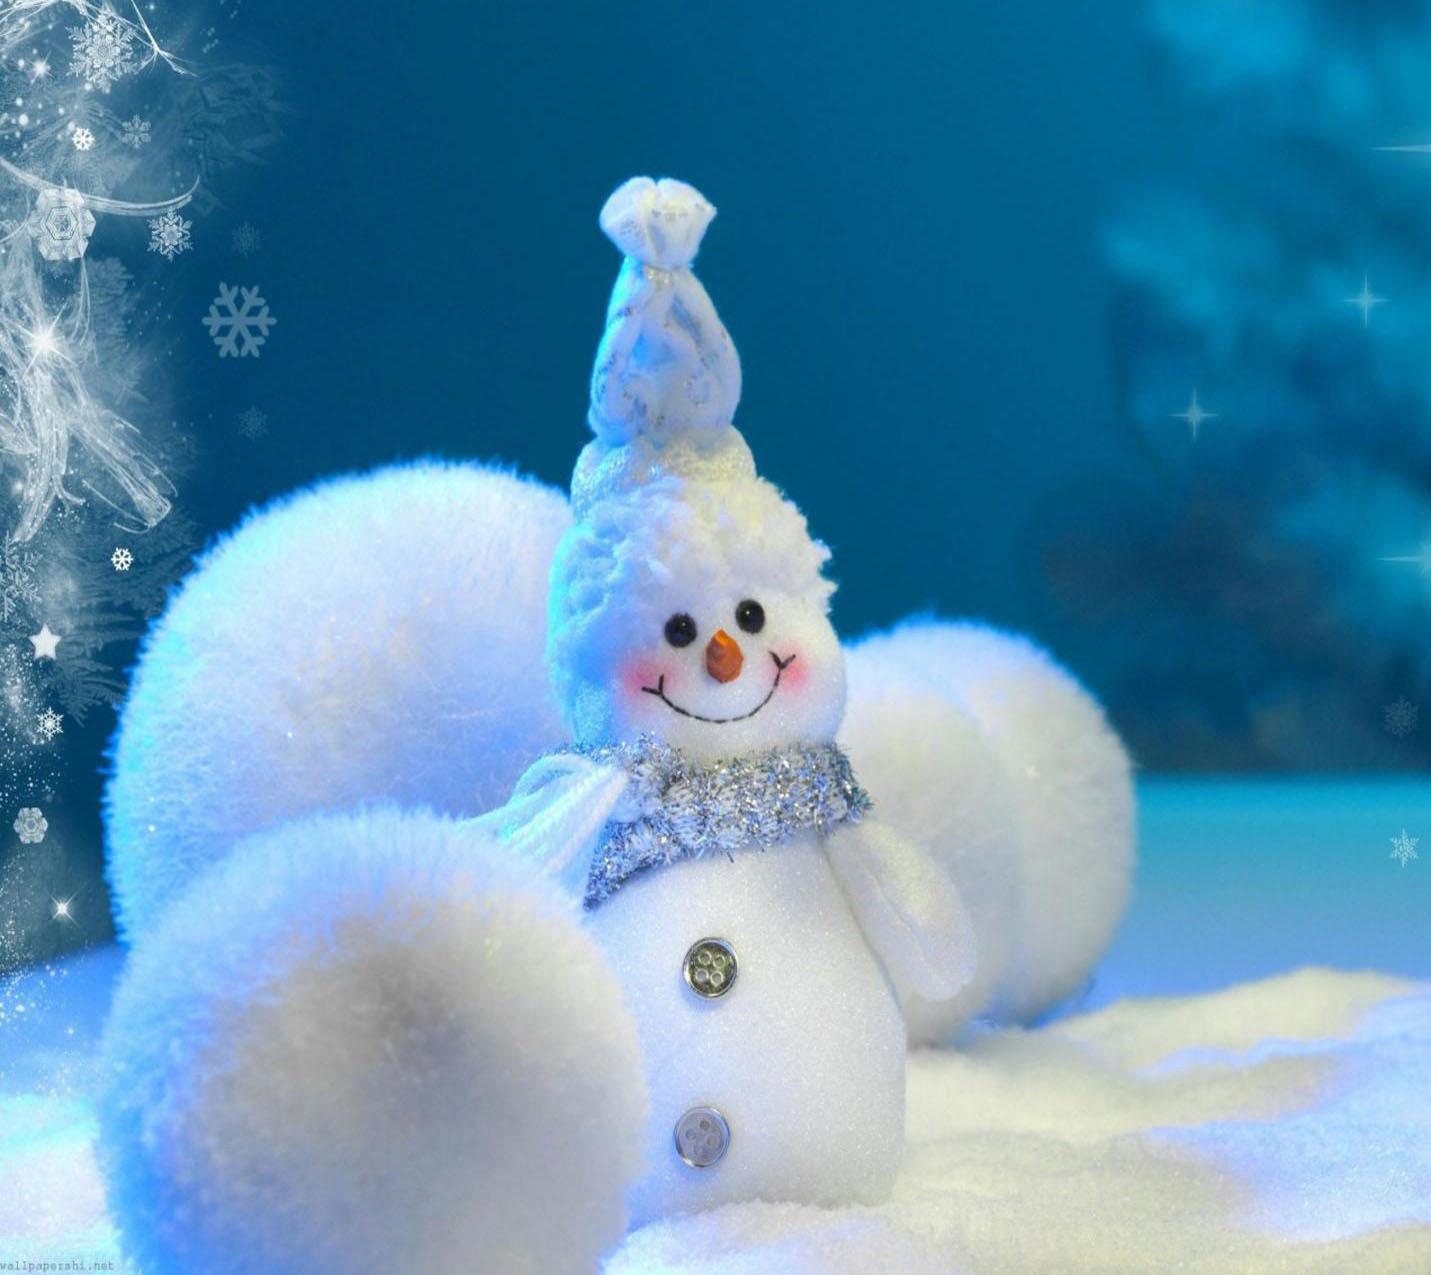 Merry Christmas Whatsapp Status | Happy Christmas Whatsapp DP Pics, Download Whatsapp Status for Merry Christmas